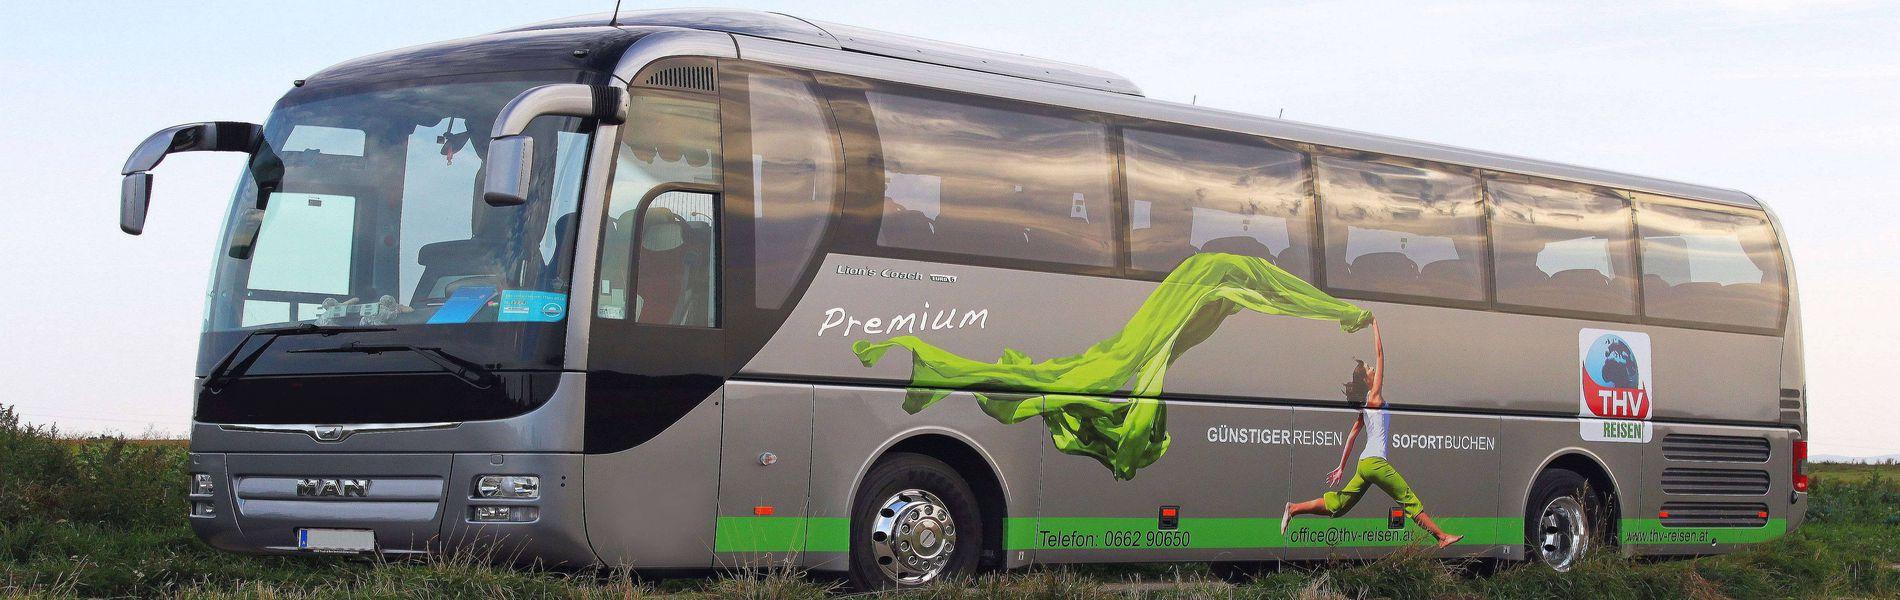 busreise london ostern